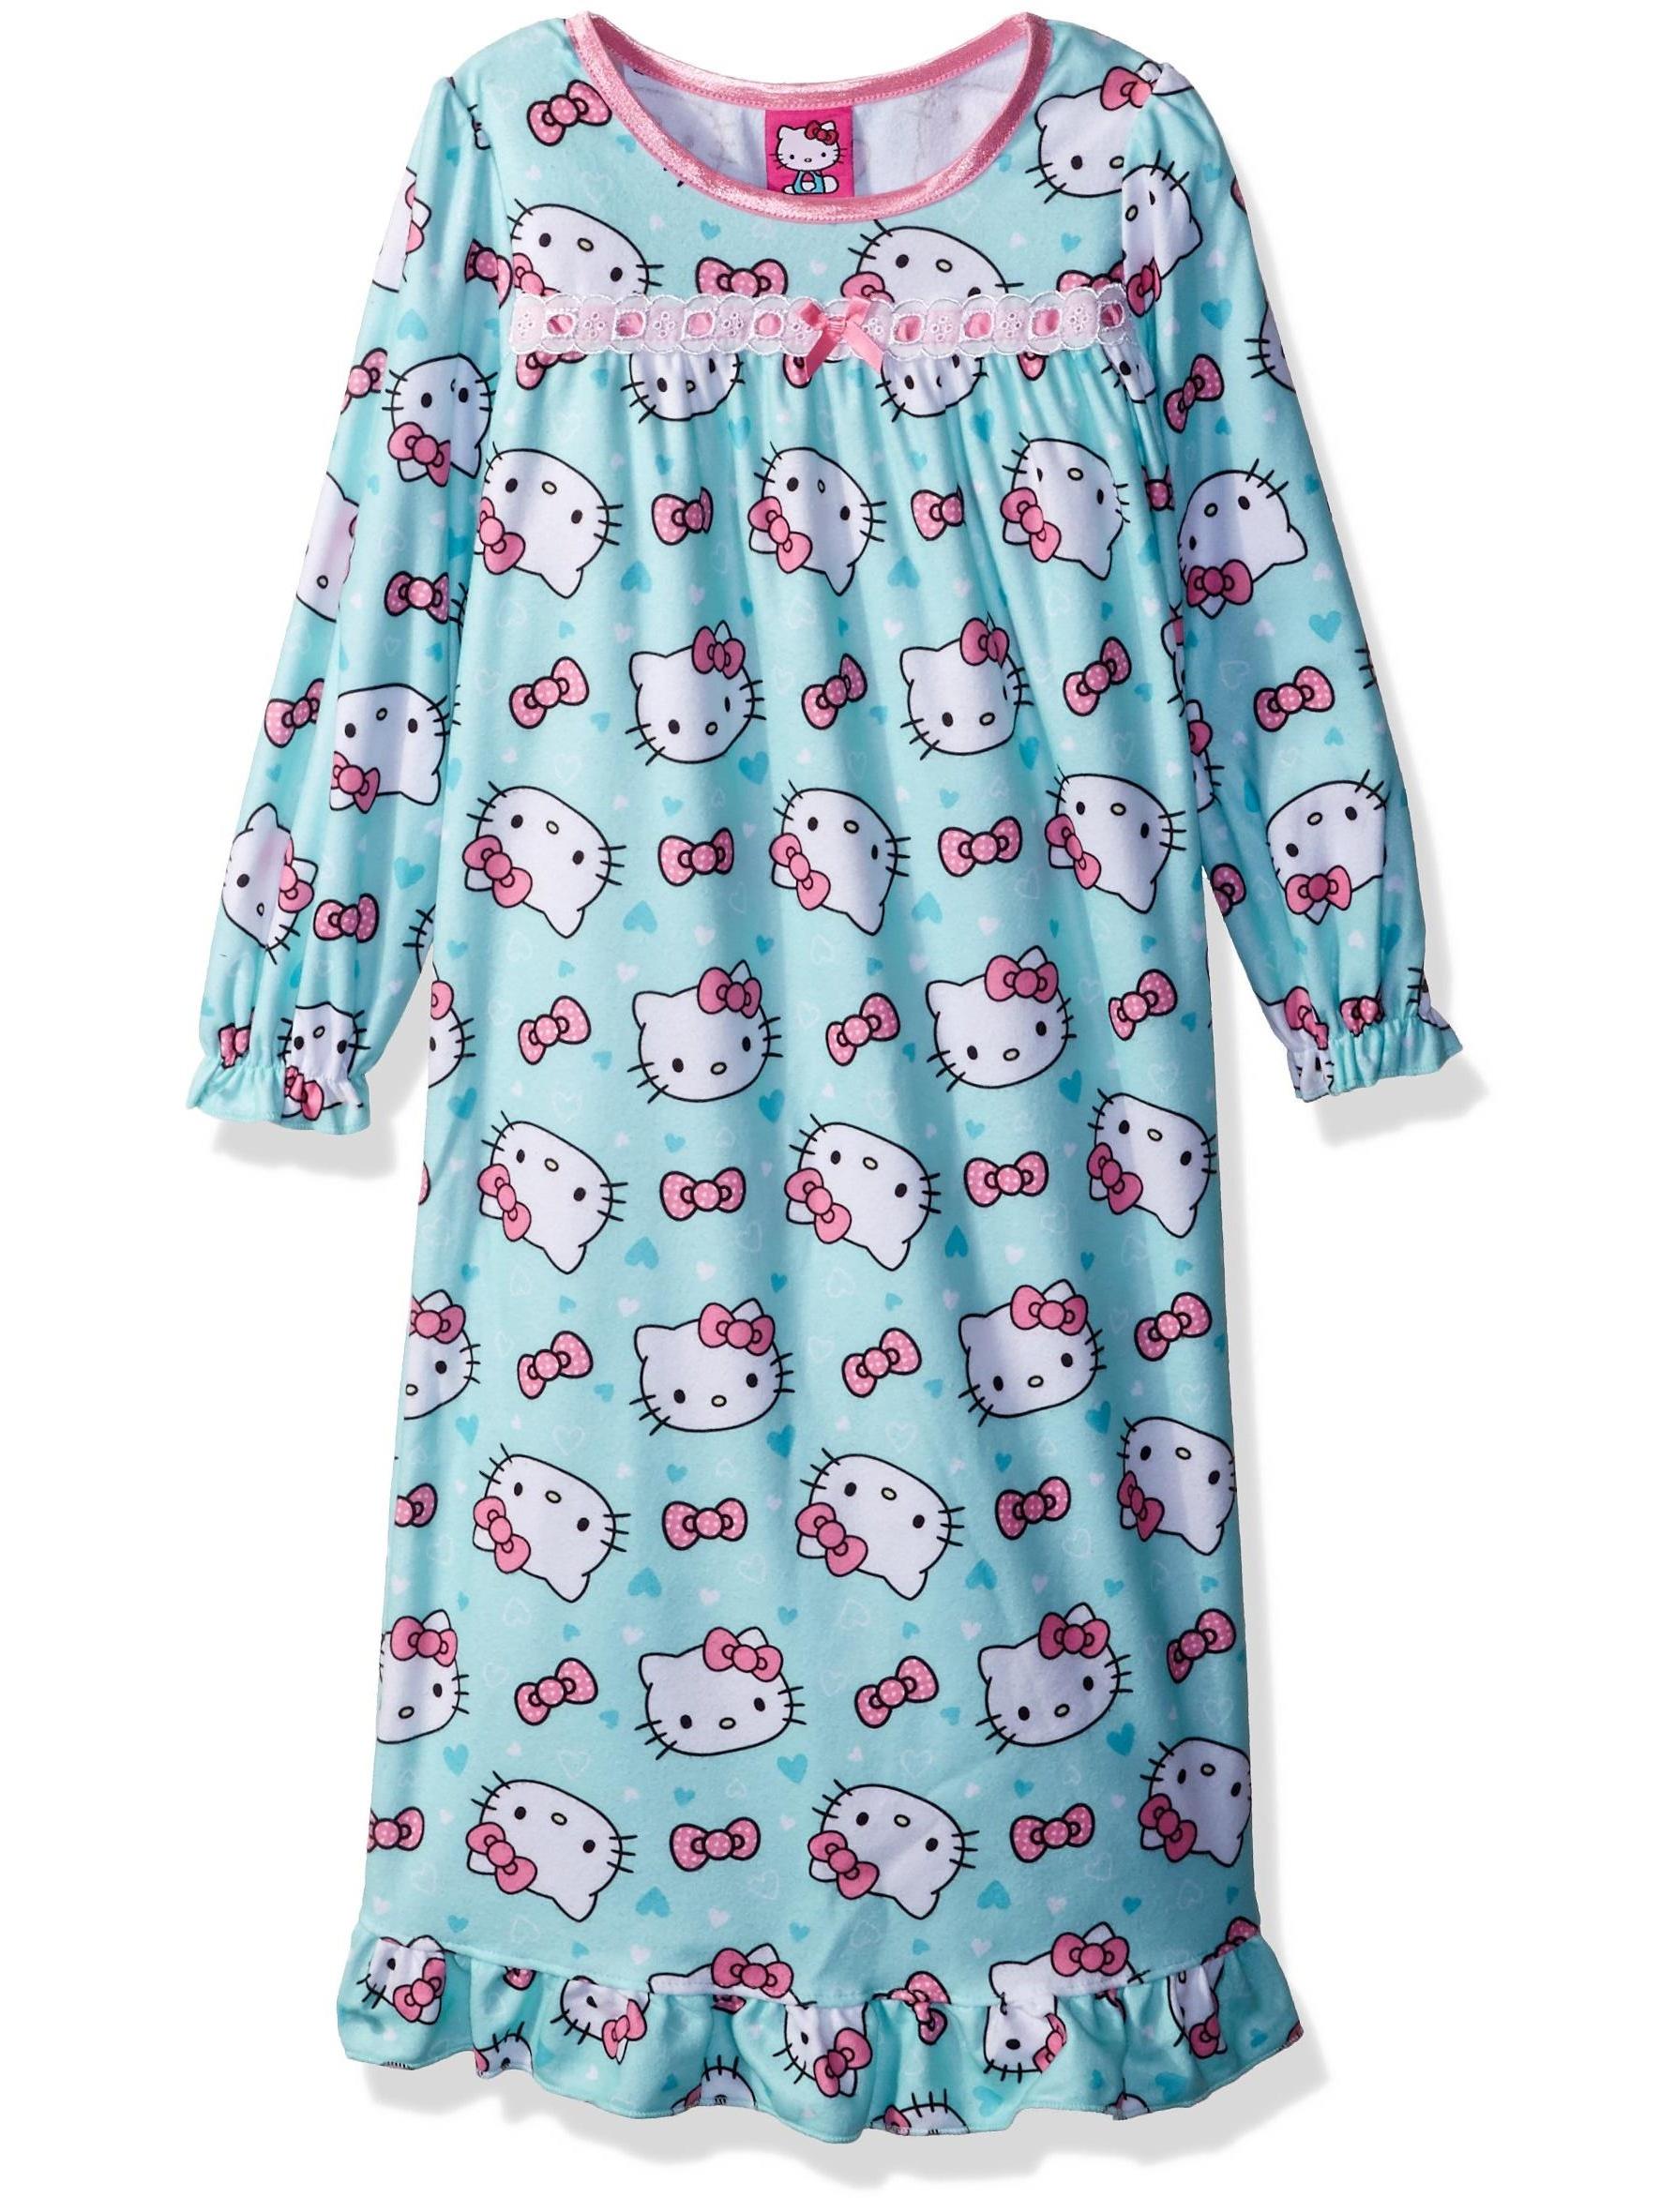 Hello Kitty Girls' Polka Dots and Daisies Nightgown